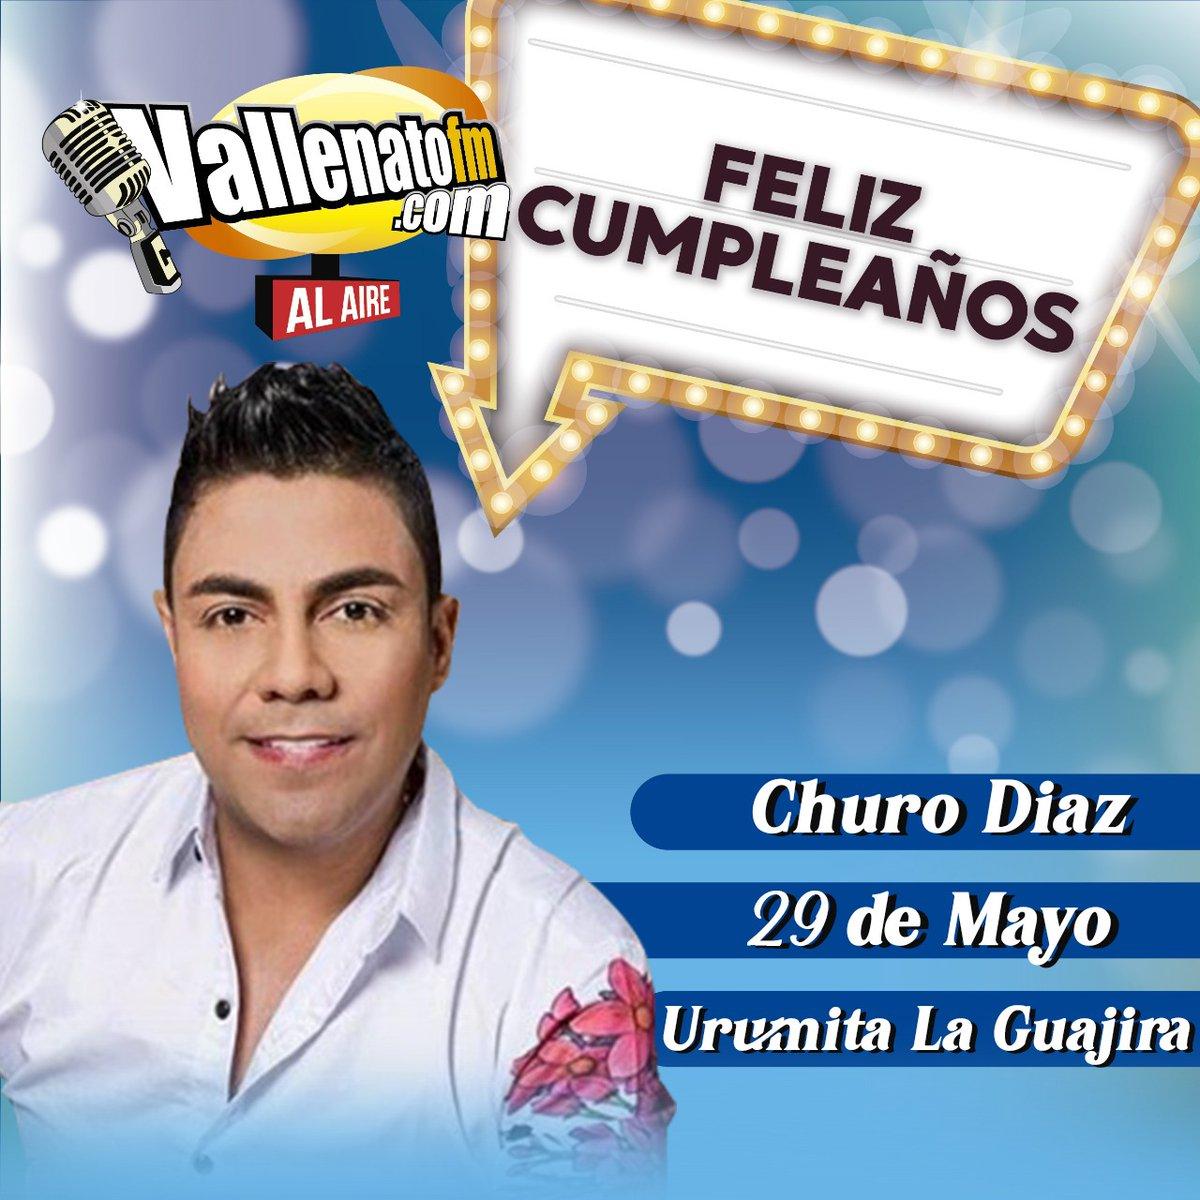 https://t.co/0RS18TIpsH felicita en su dia de cumpleaños a @CHURO_DIAZ muchas bendiciones https://t.co/TdcIoOTCN6